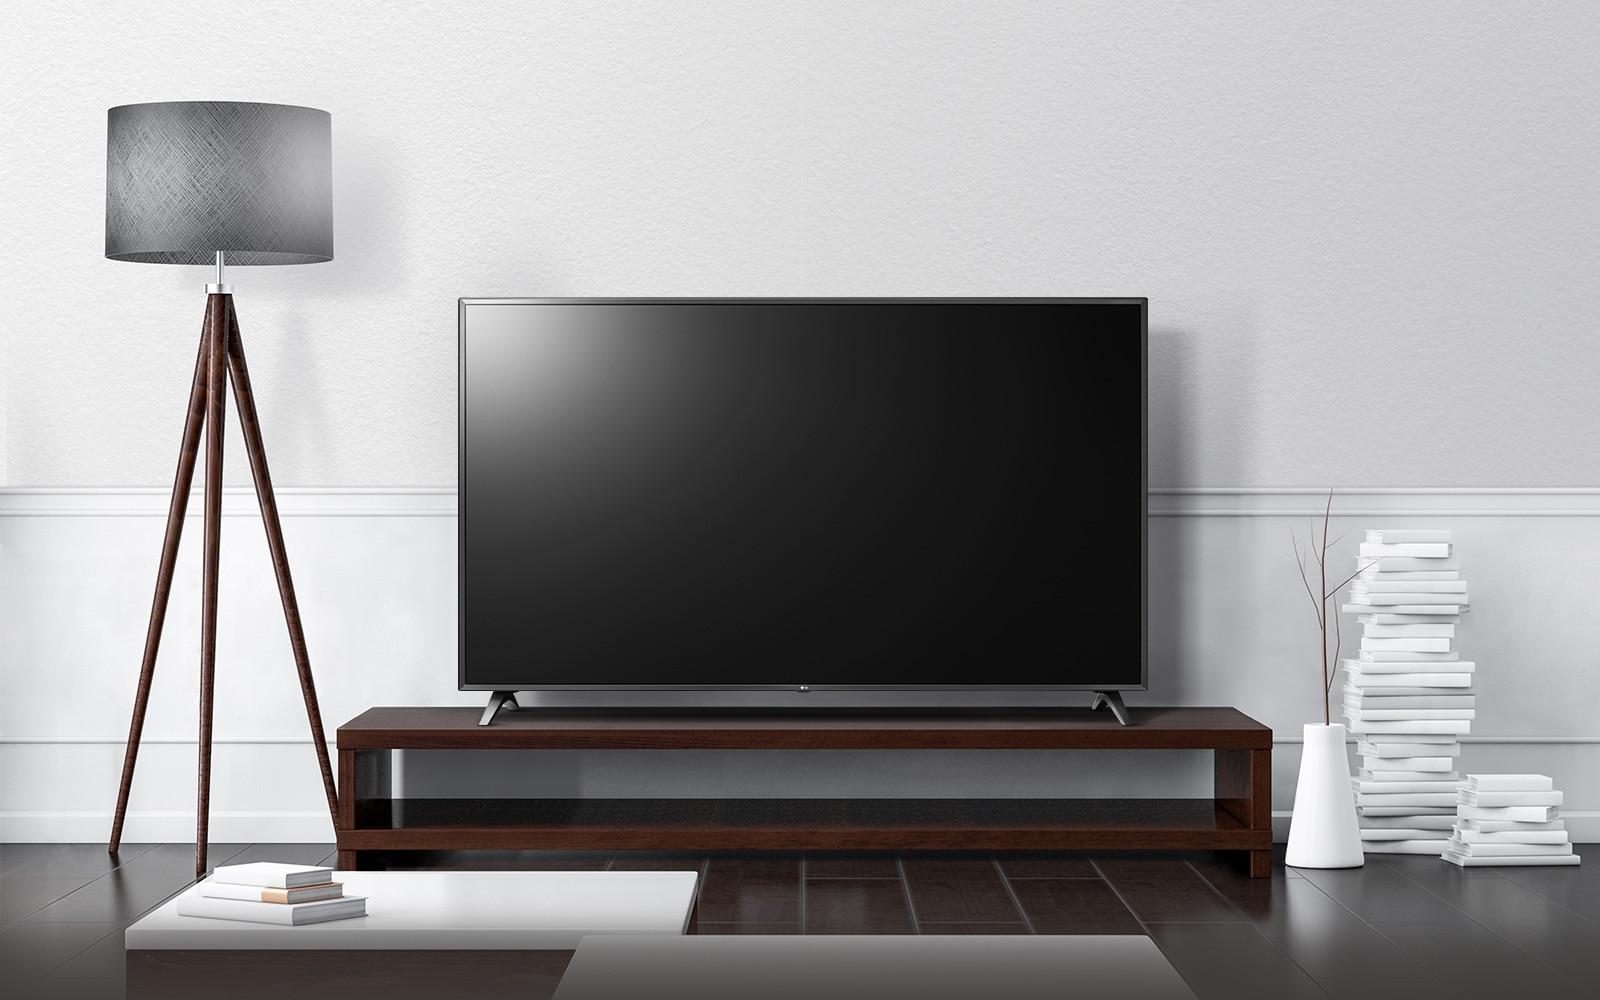 TV-UHD-50-UM76-07-Design-Desktop